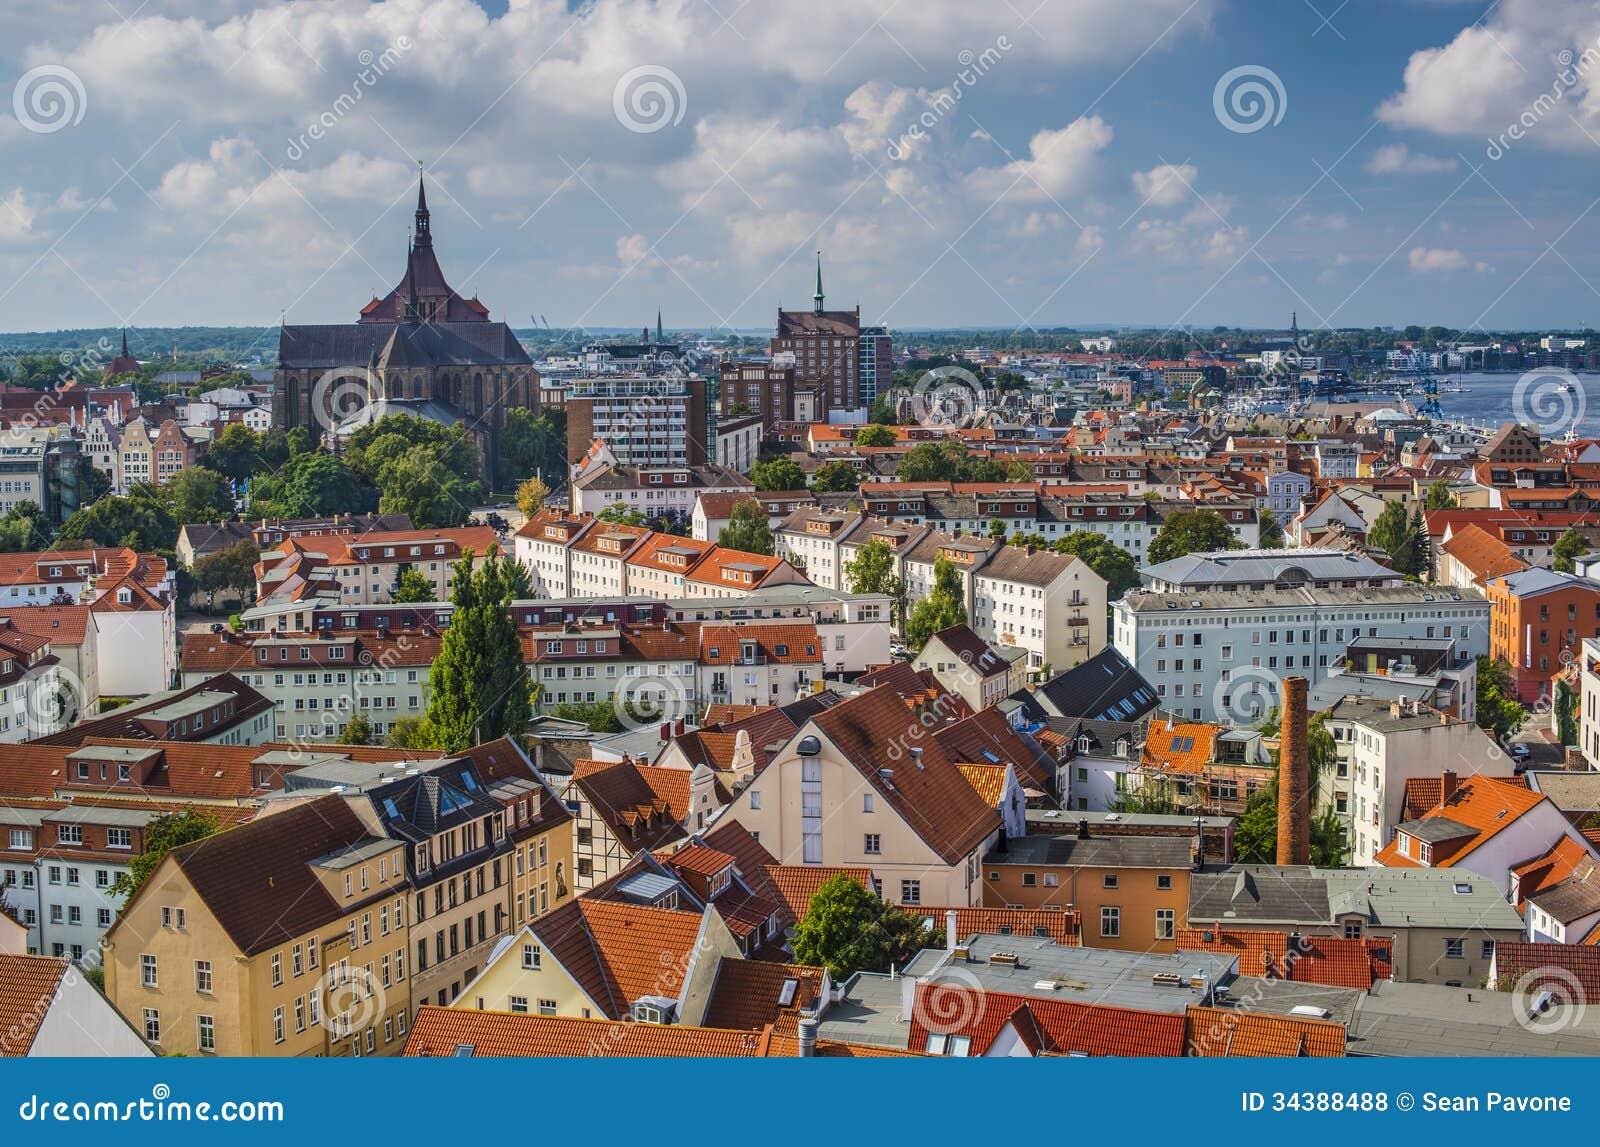 Rostock Germany  city photos gallery : Rostock Germany Royalty Free Stock Photos Image: 34388488